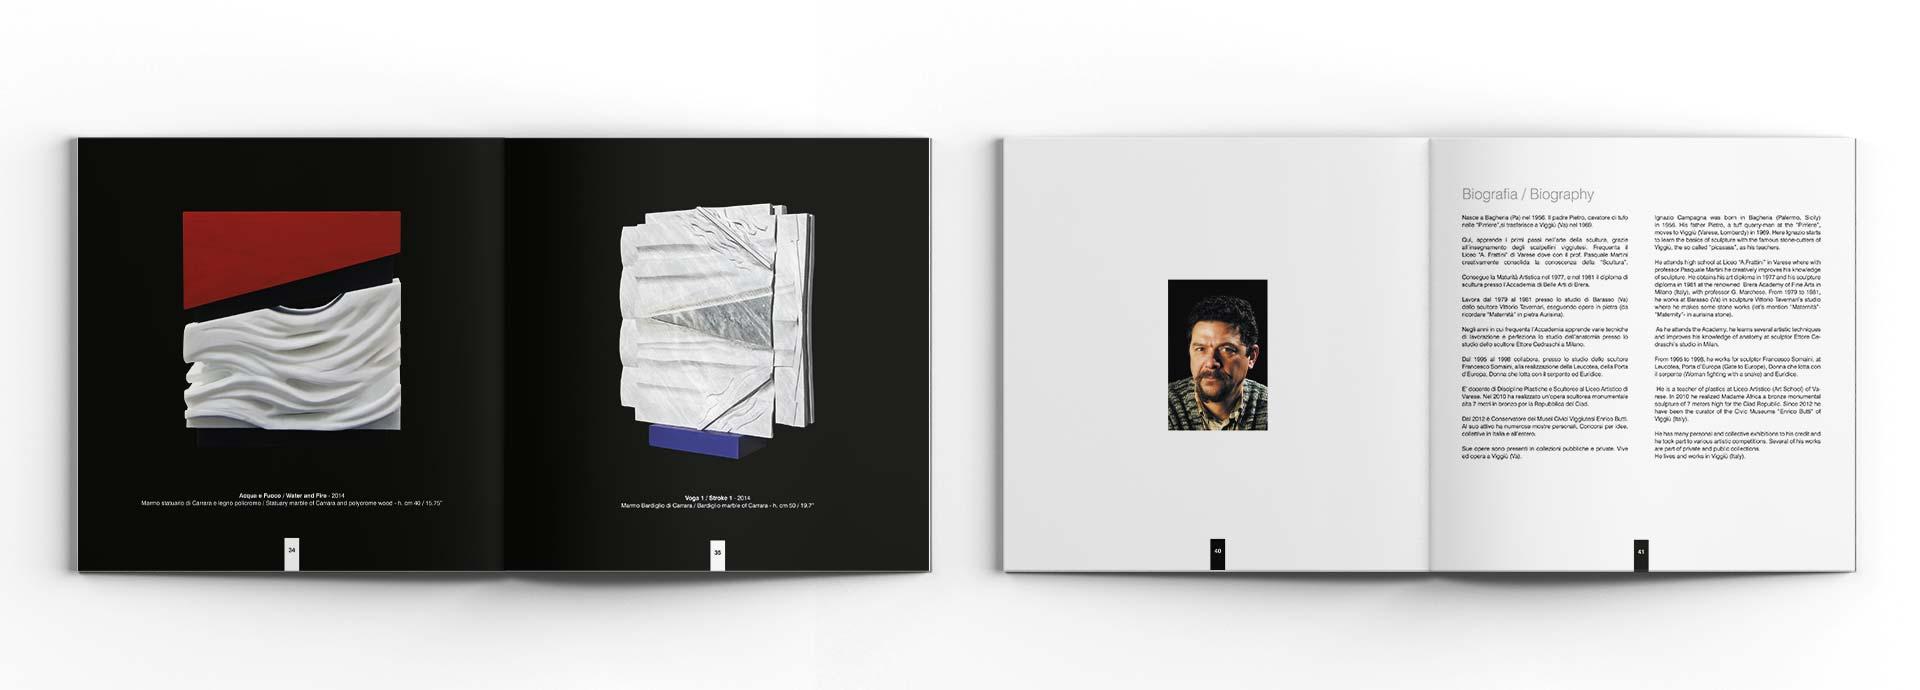 Studio garfico catalogo per artista